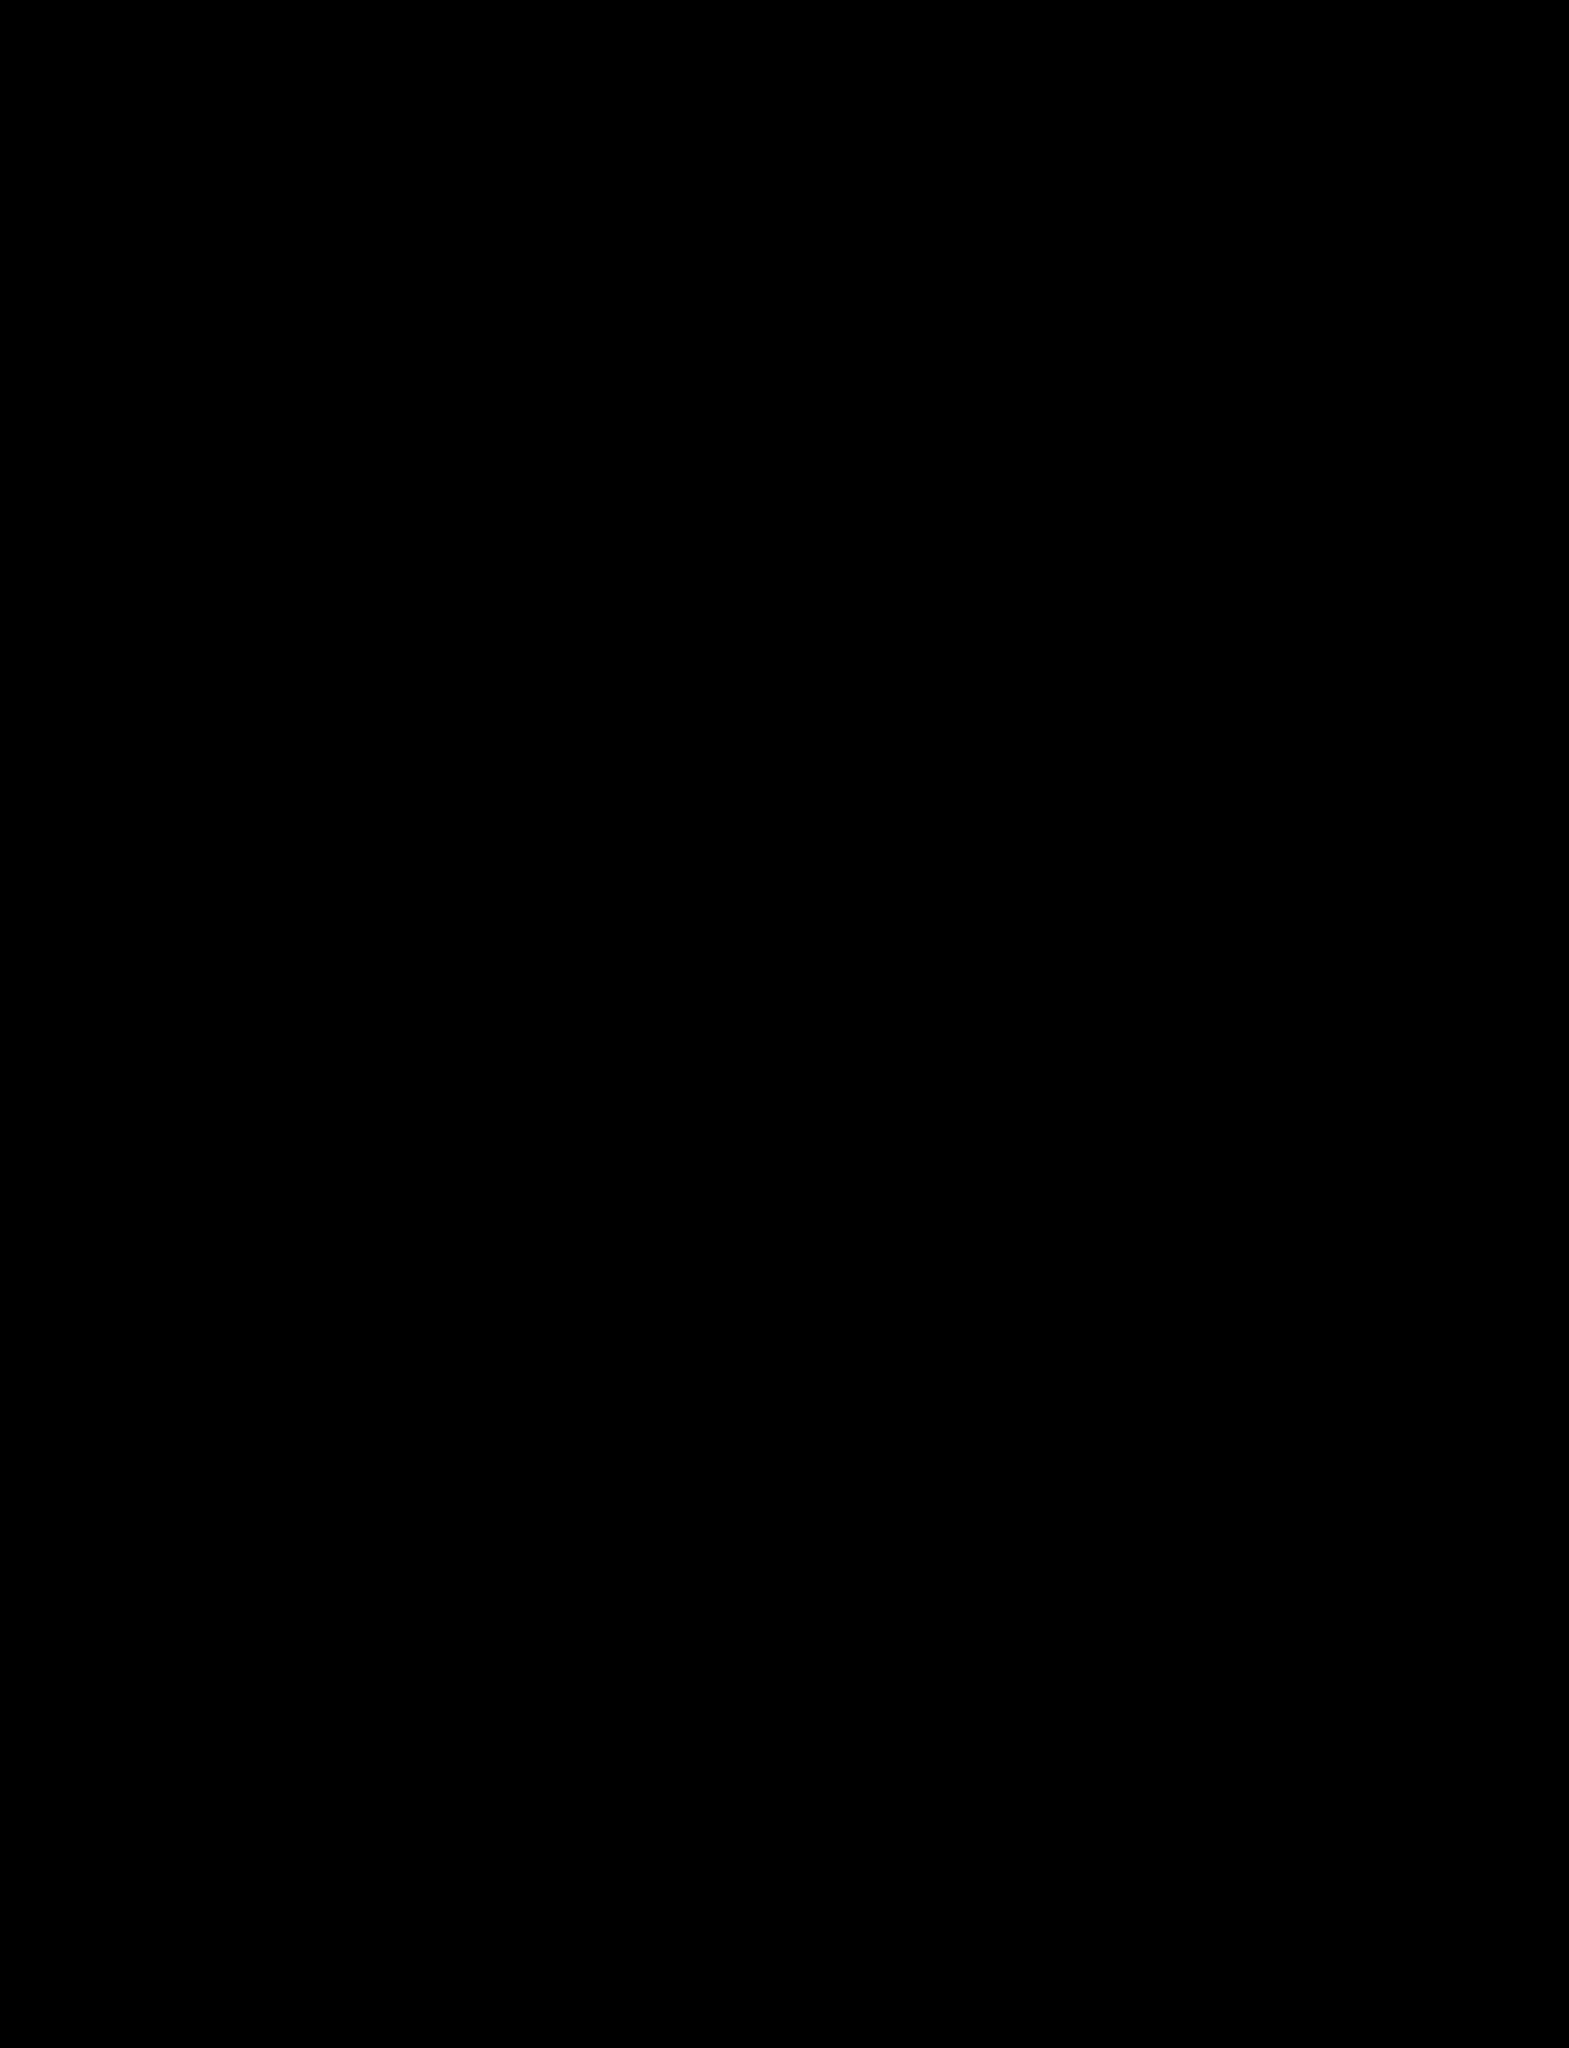 1569x2048 Princess Clipart Silhouette